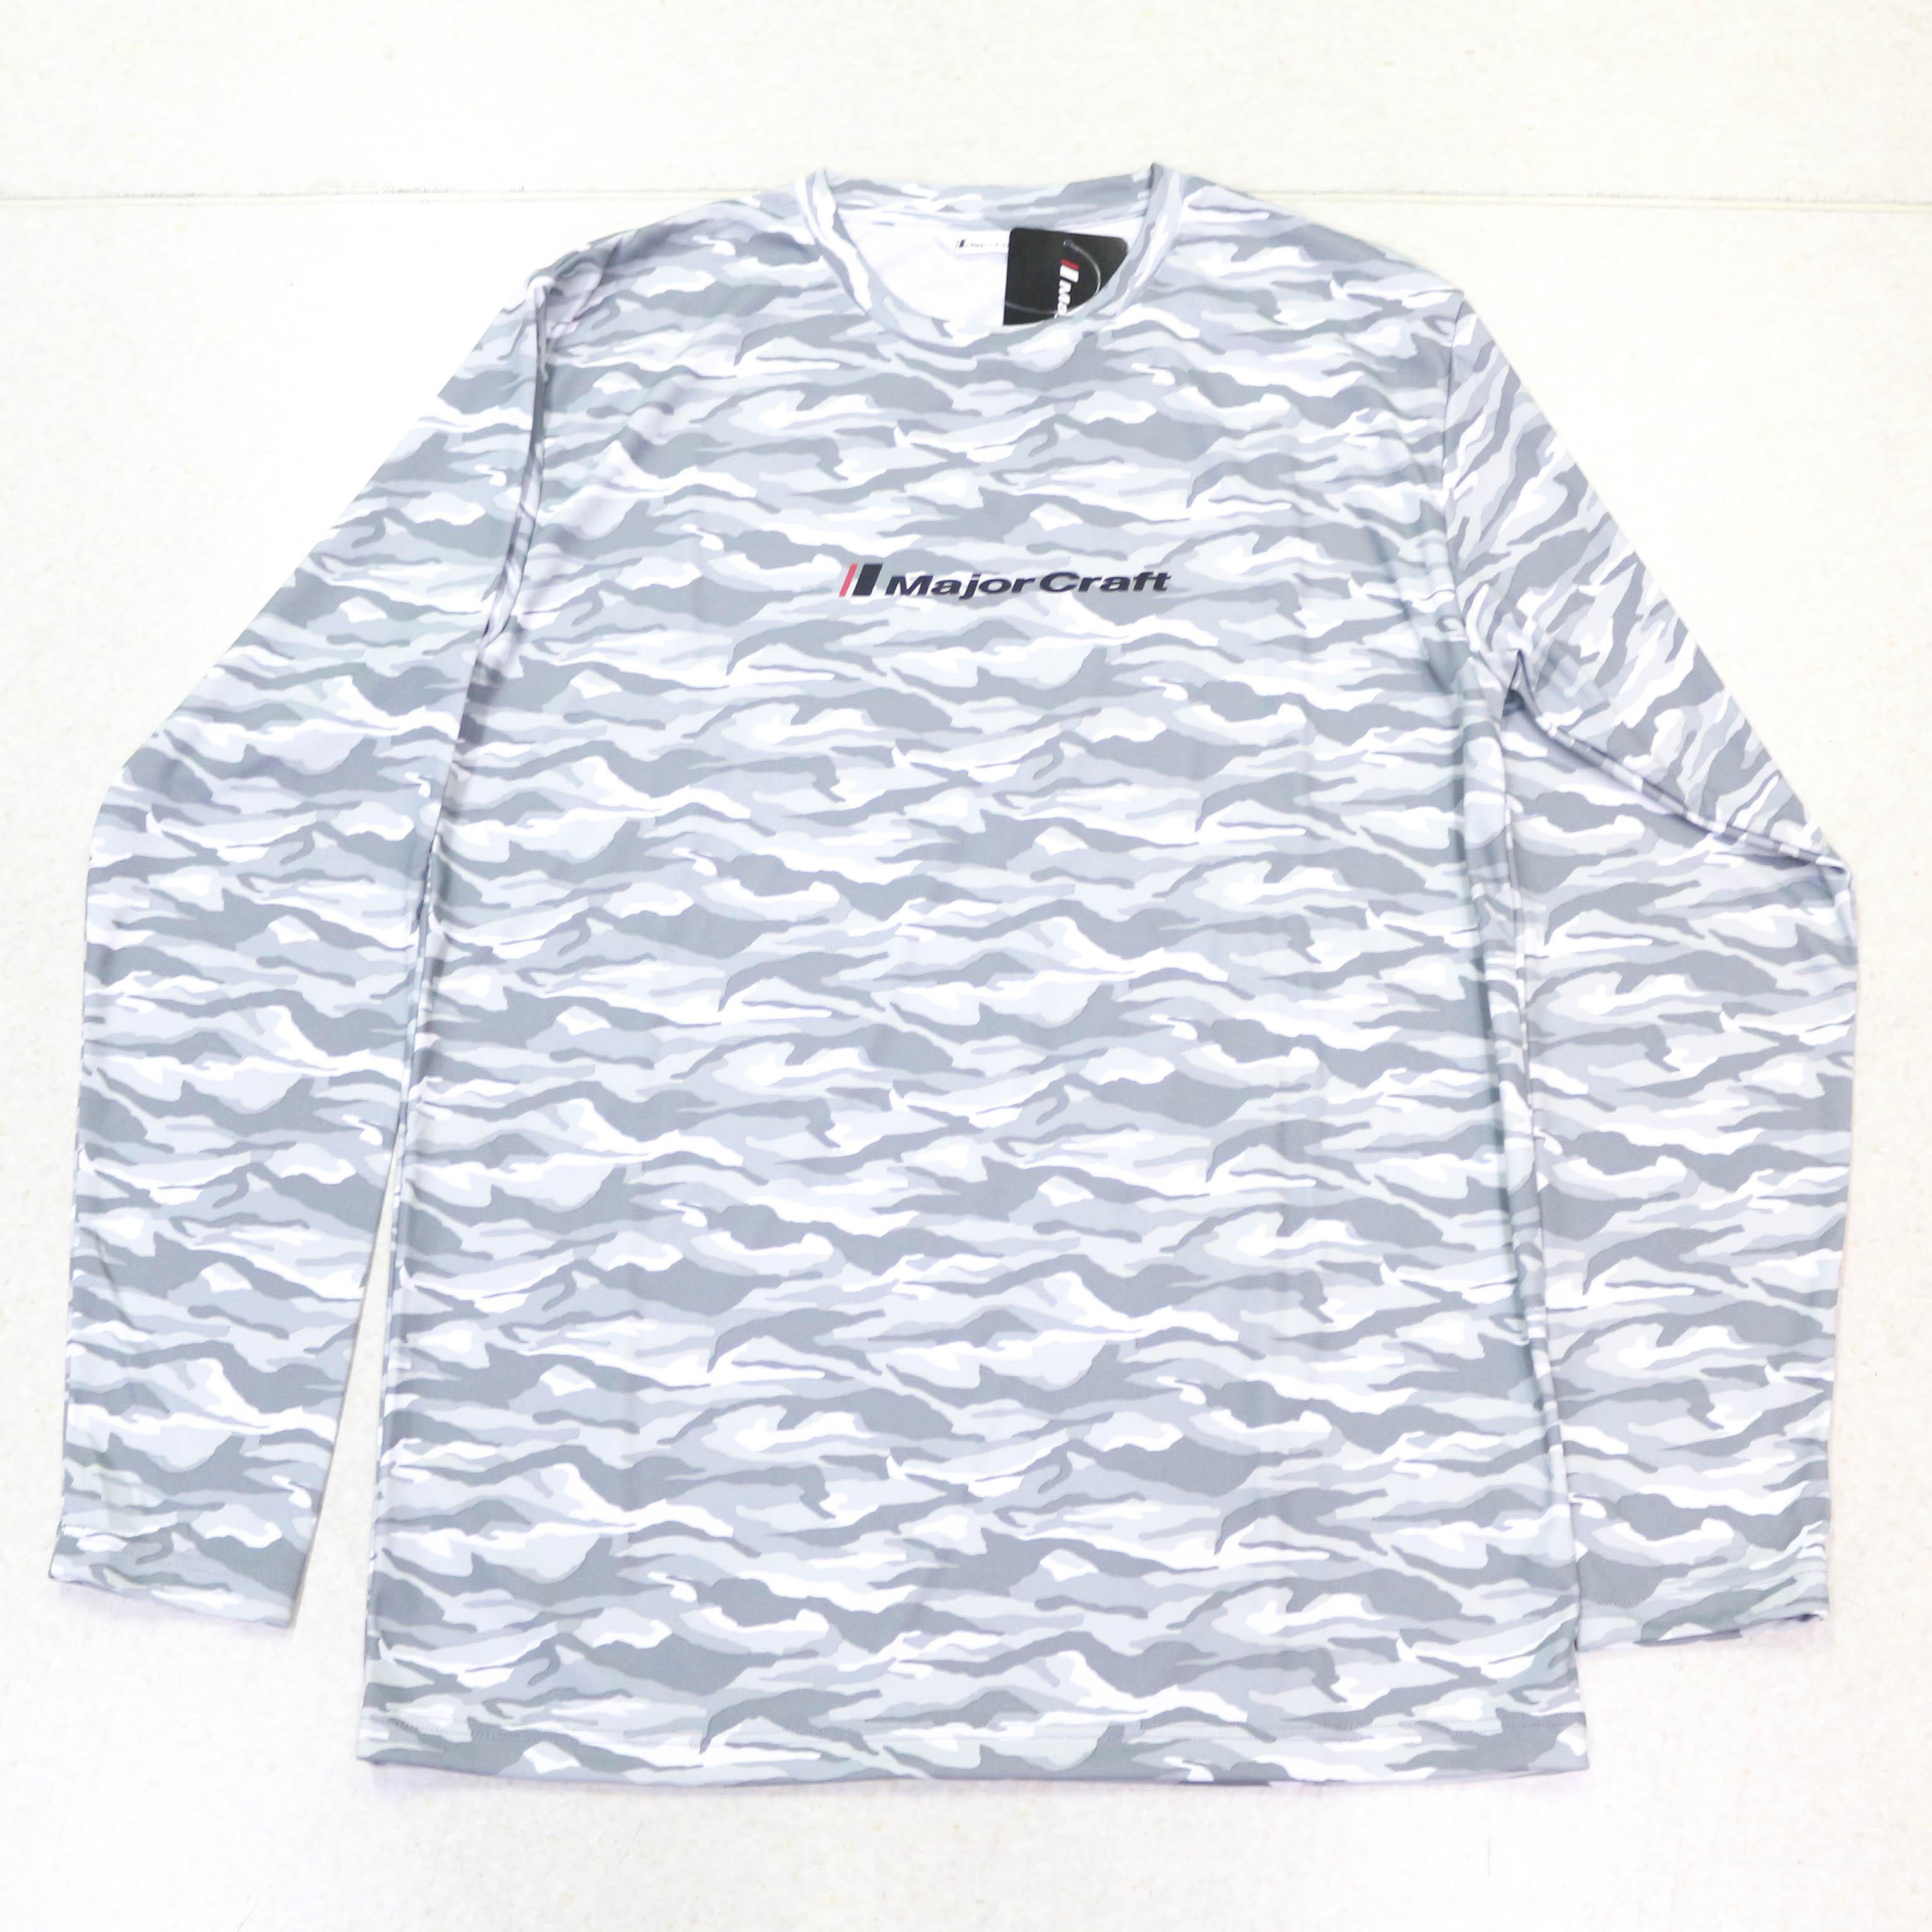 Major Craft T-Shirt Long Sleeve MCW-DLT-S/GCM (3048)